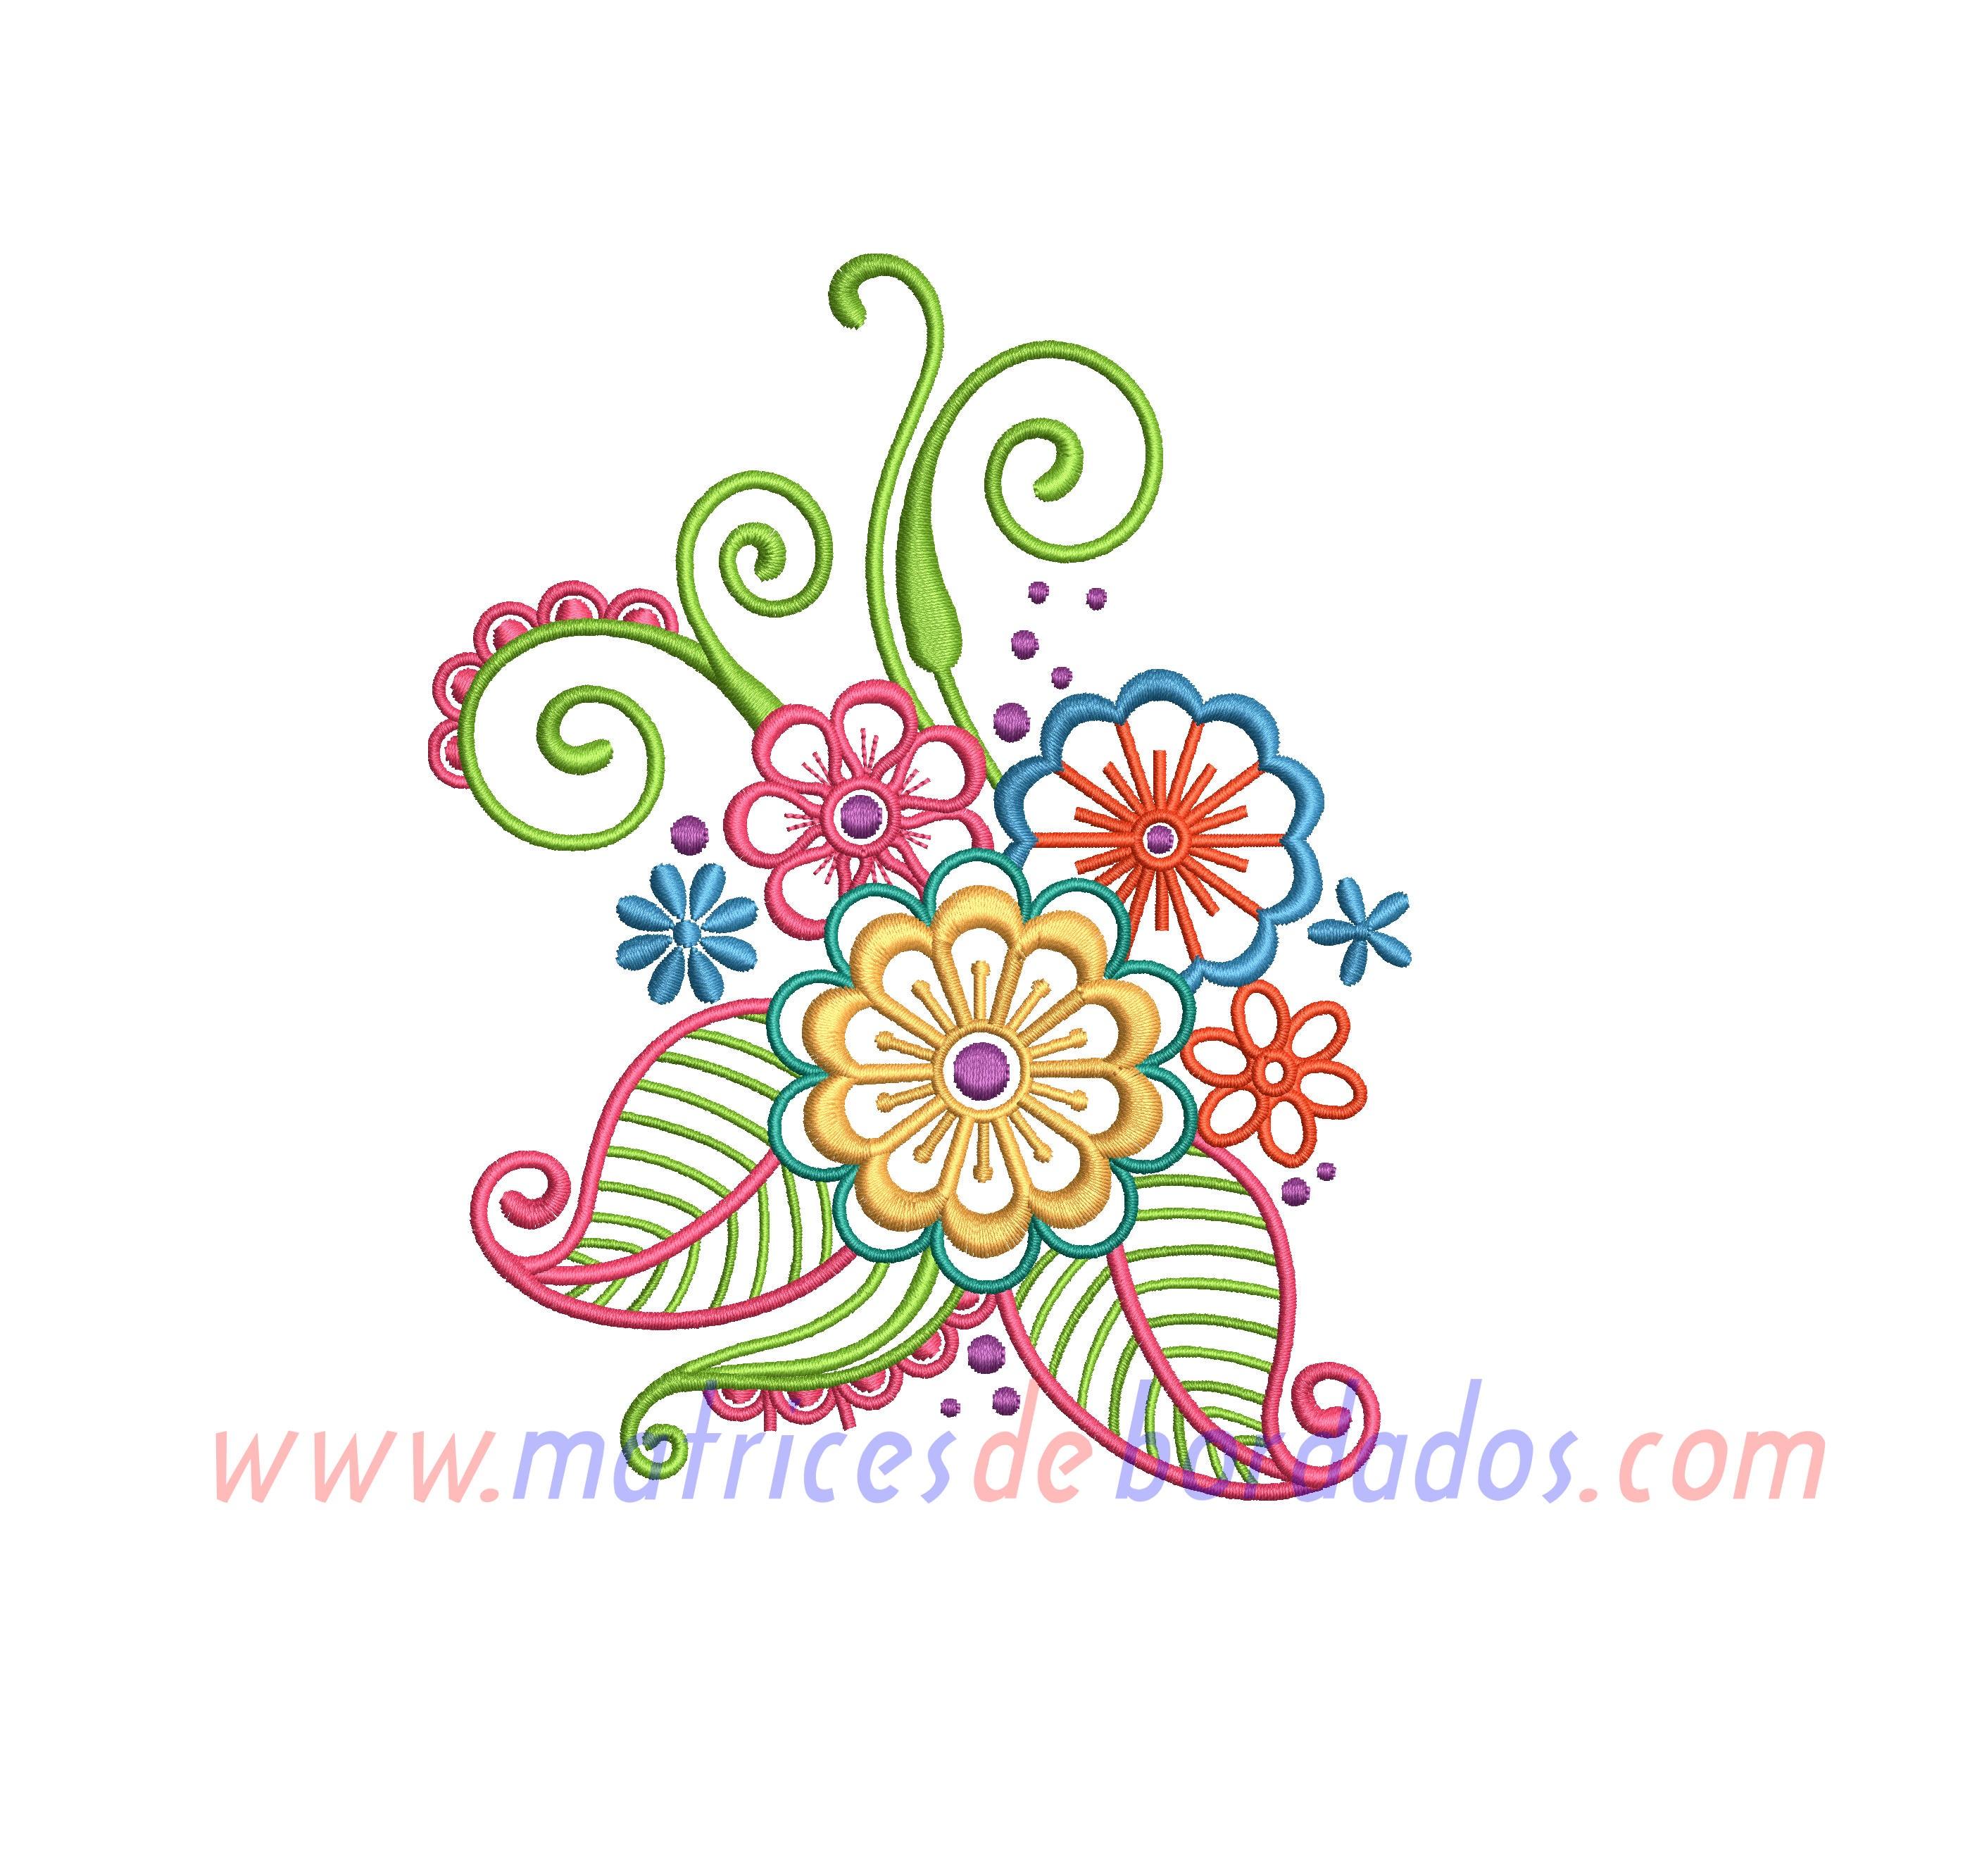 CF61JA - Diseño Floral